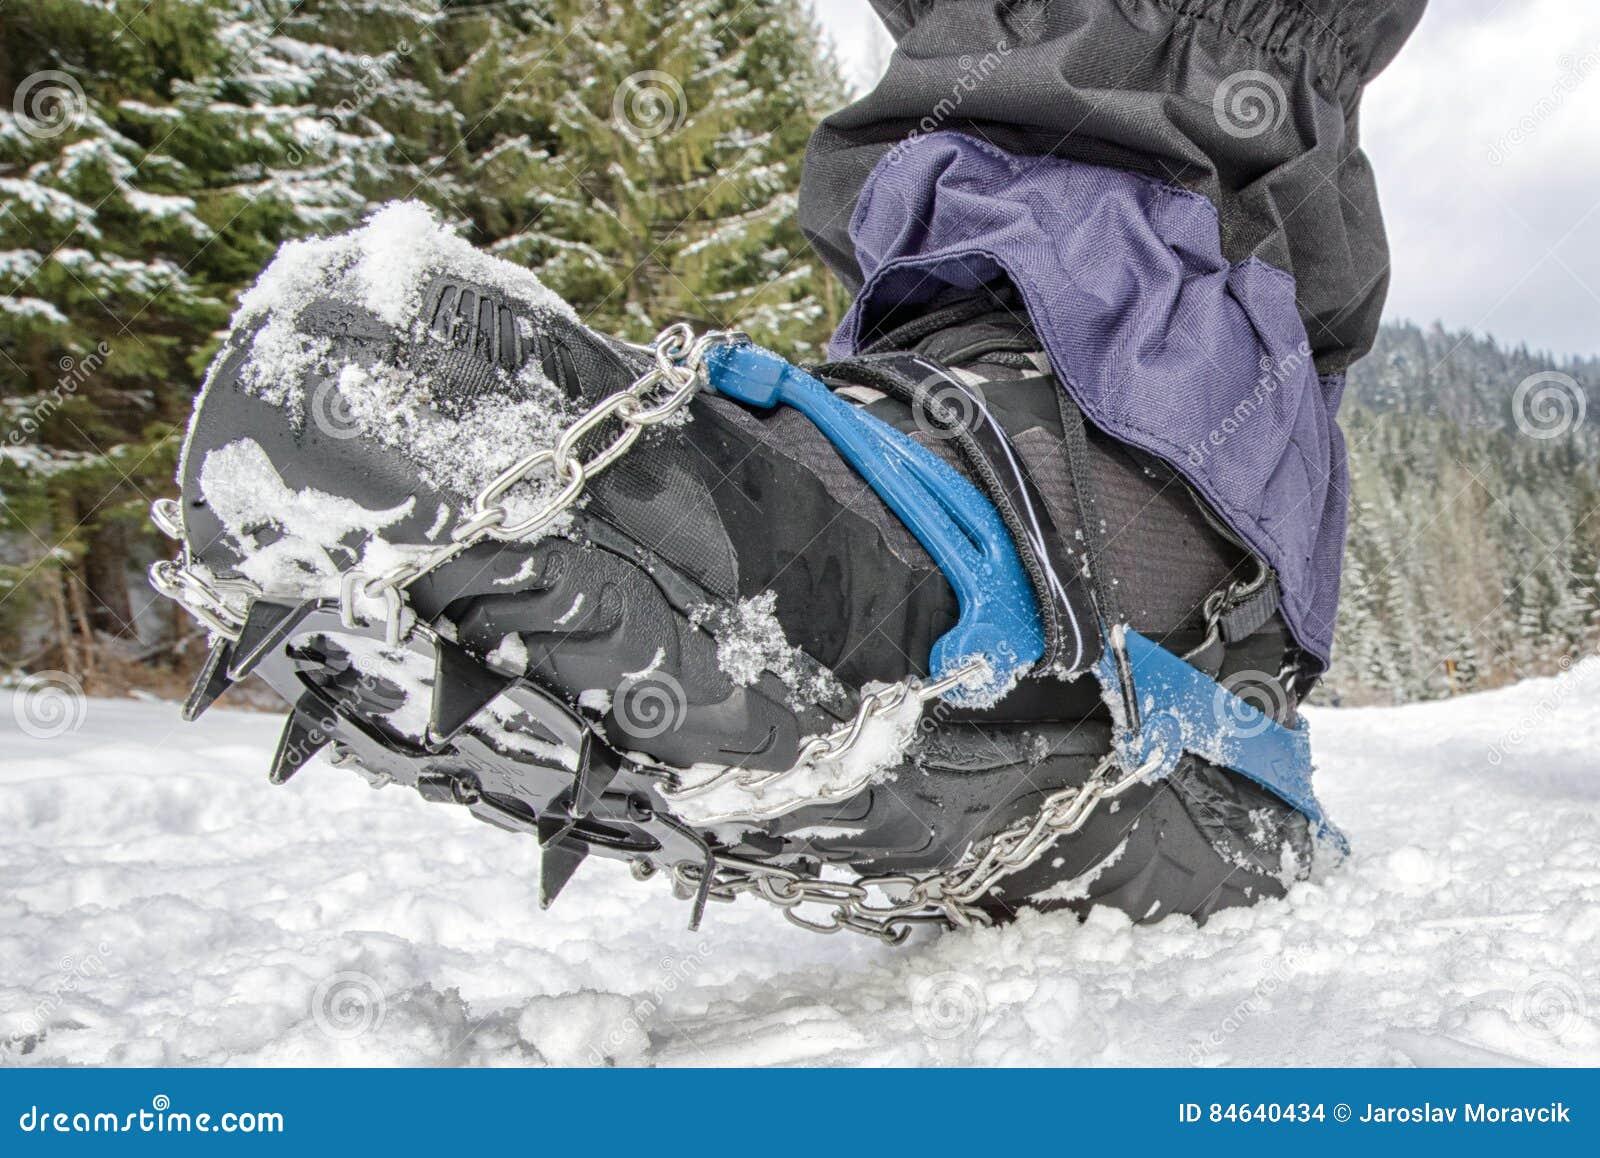 89800785f51 Σκυλιά έλκηθρου στην μπότα πεζοπορίας Στοκ Εικόνες - εικόνα από έξω ...